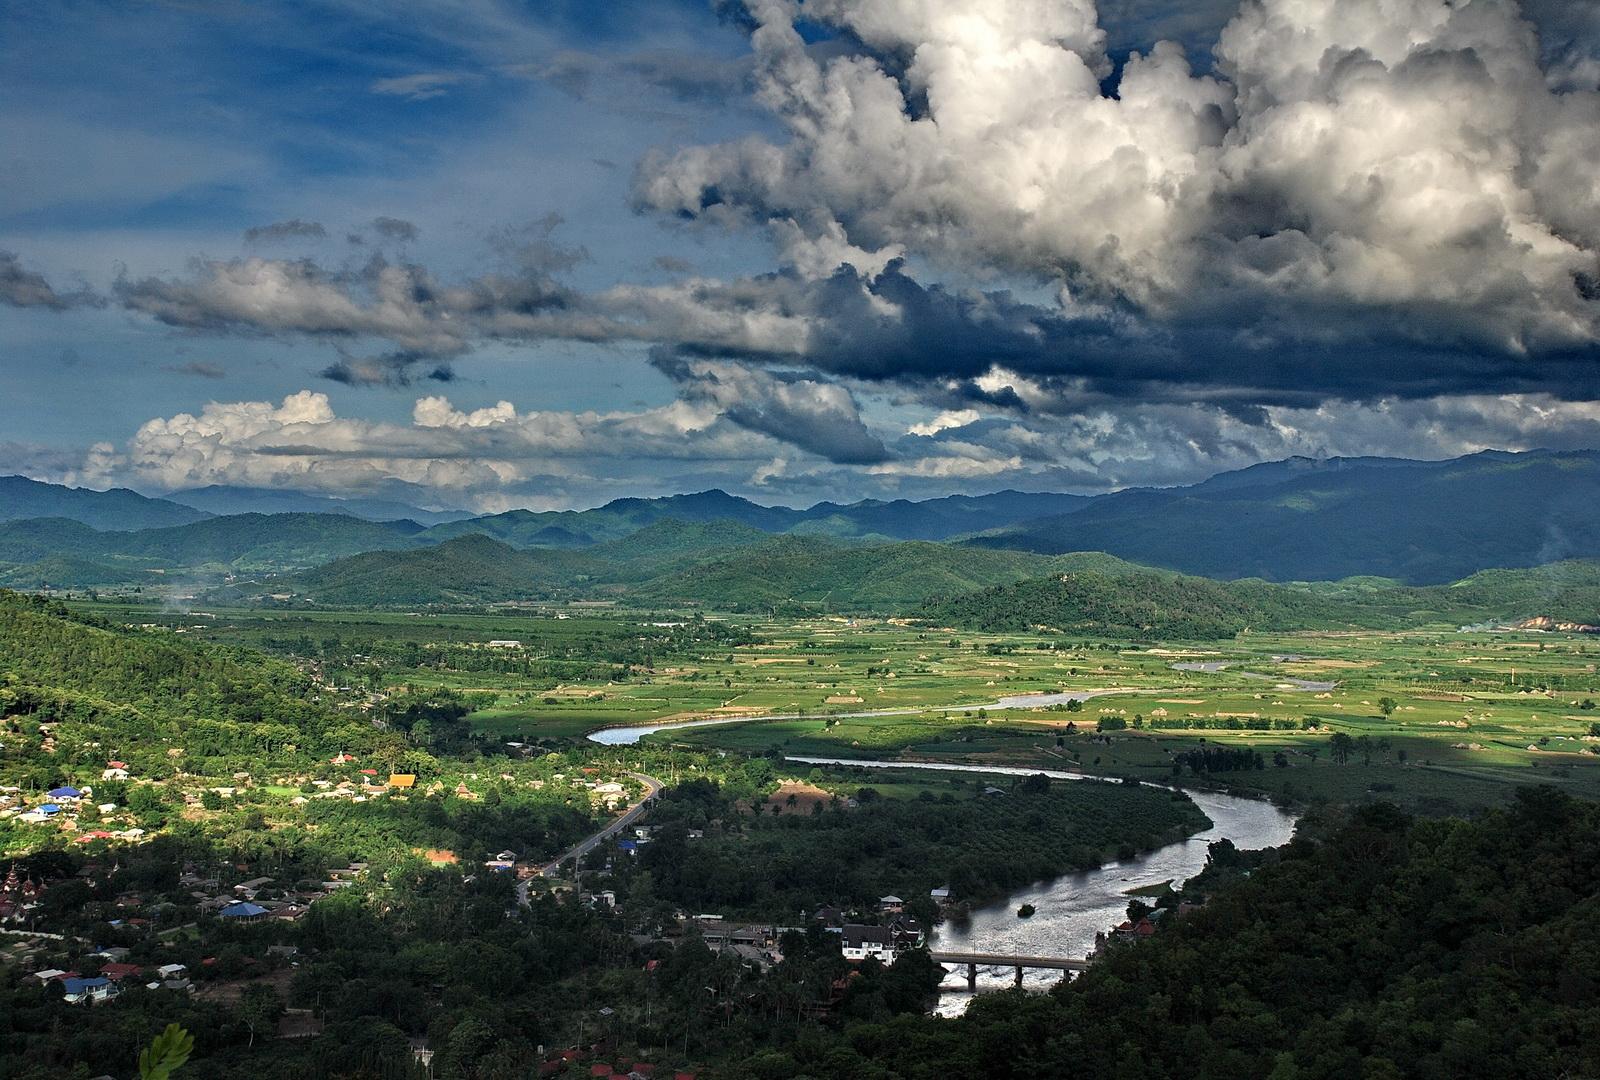 Kok valley